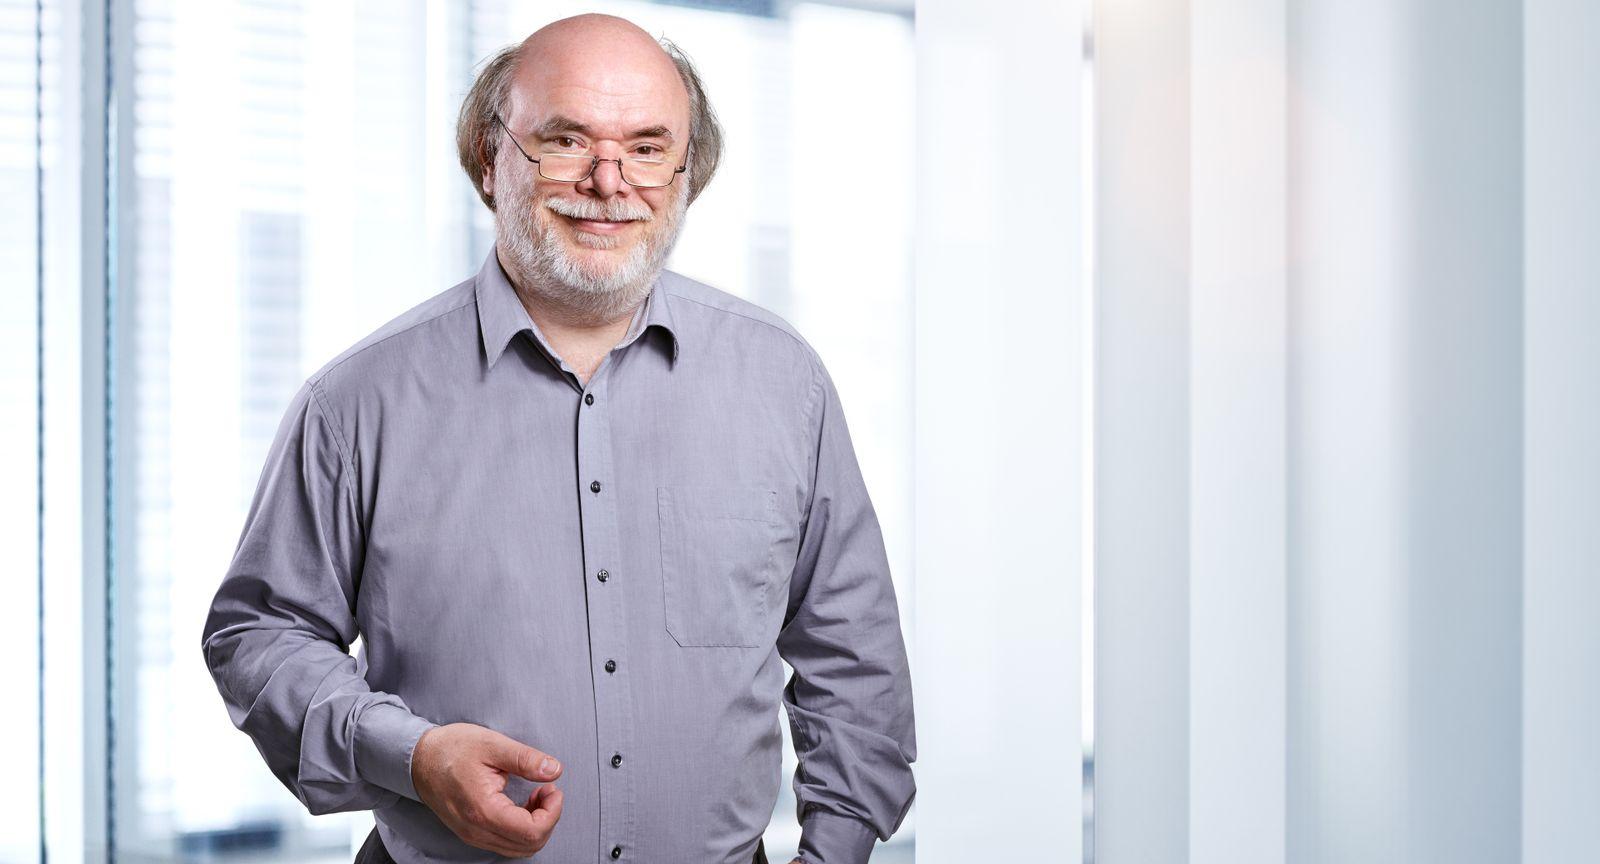 Prof. Dr. Philipp Slusallek